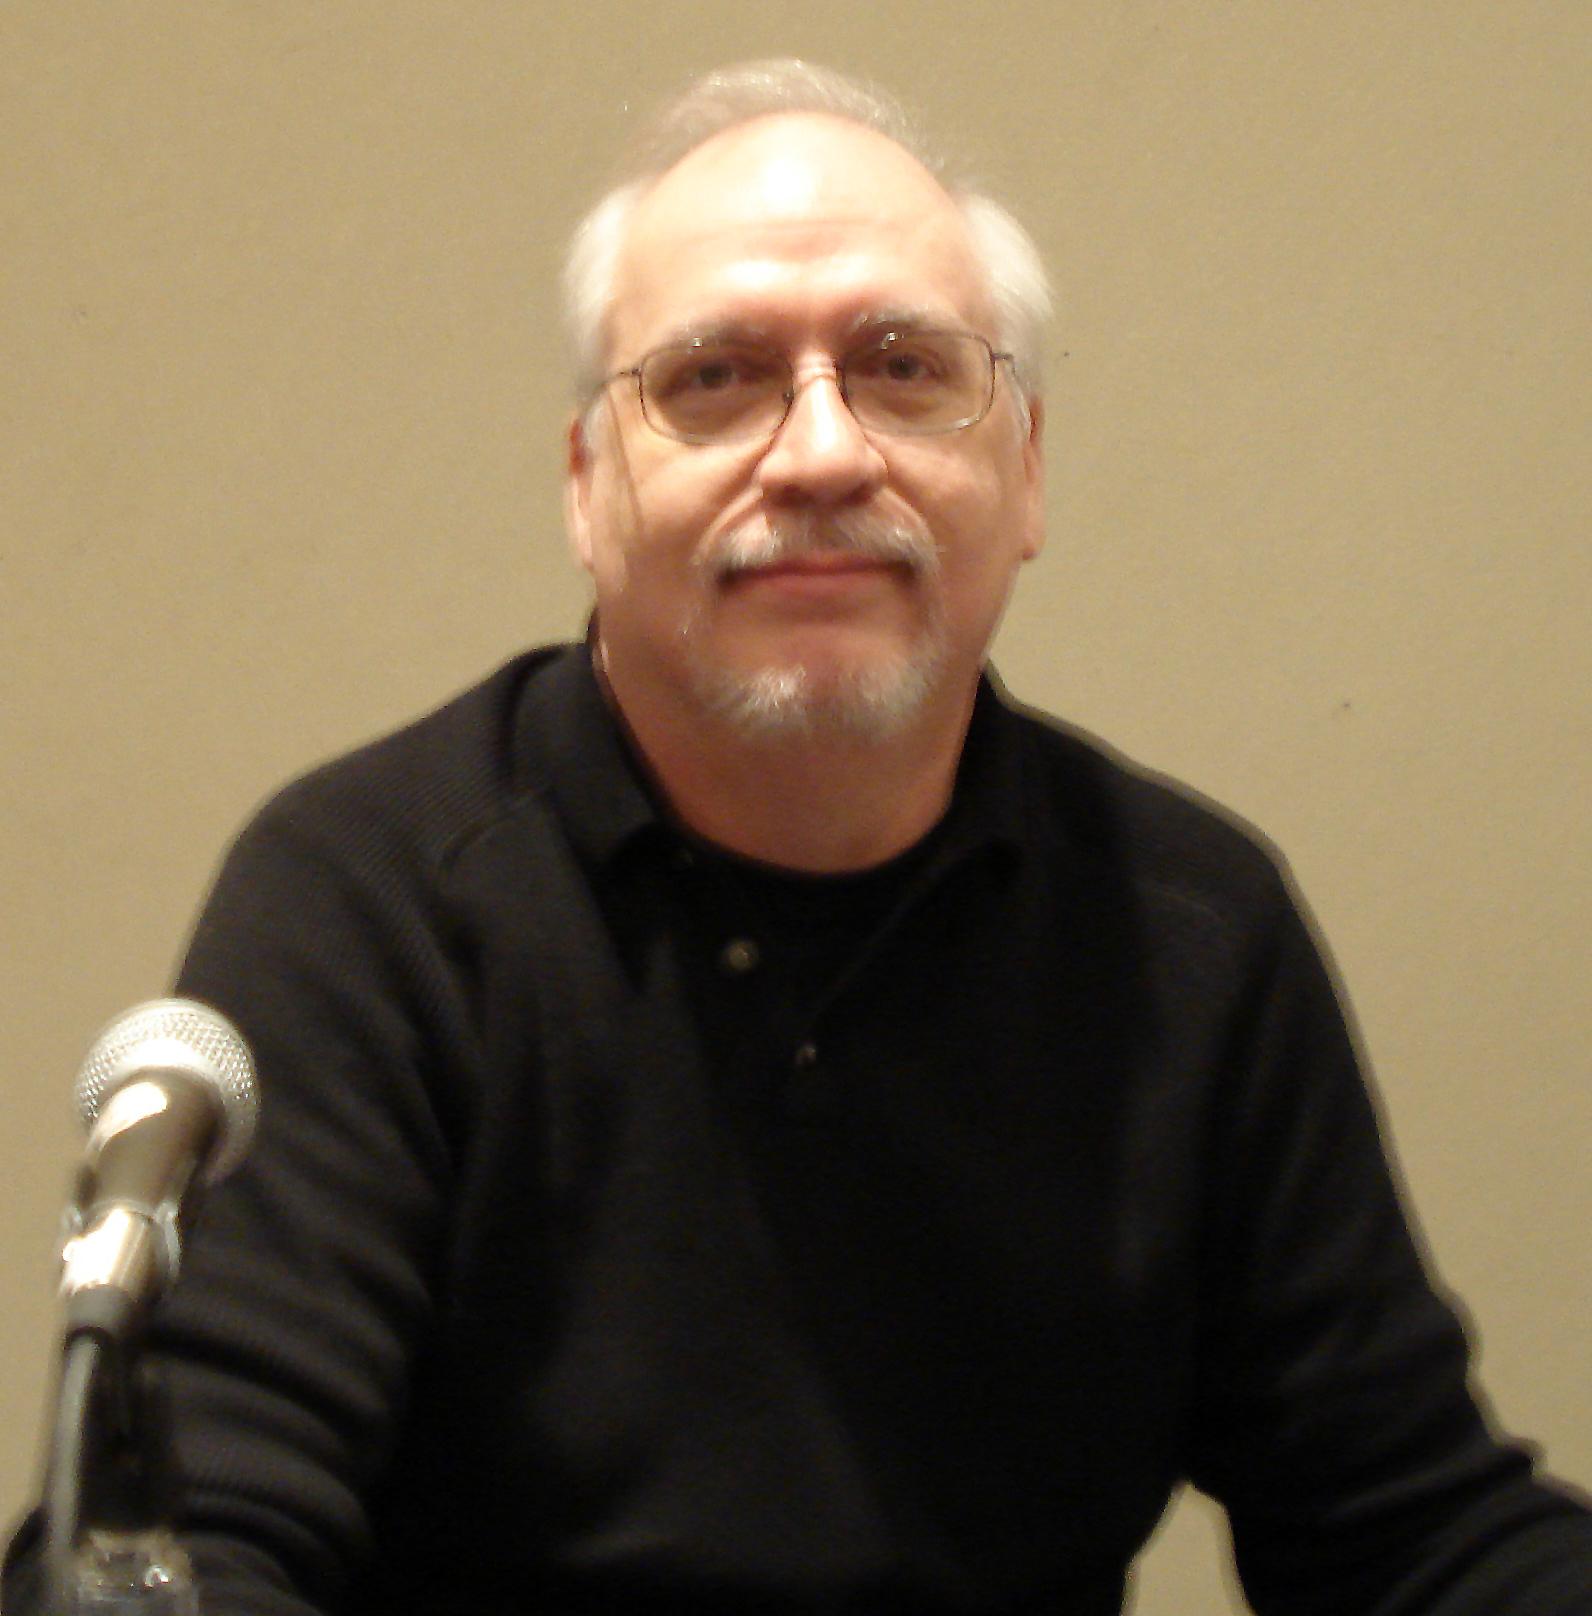 J. Michael Straczynski (Earth-1218)